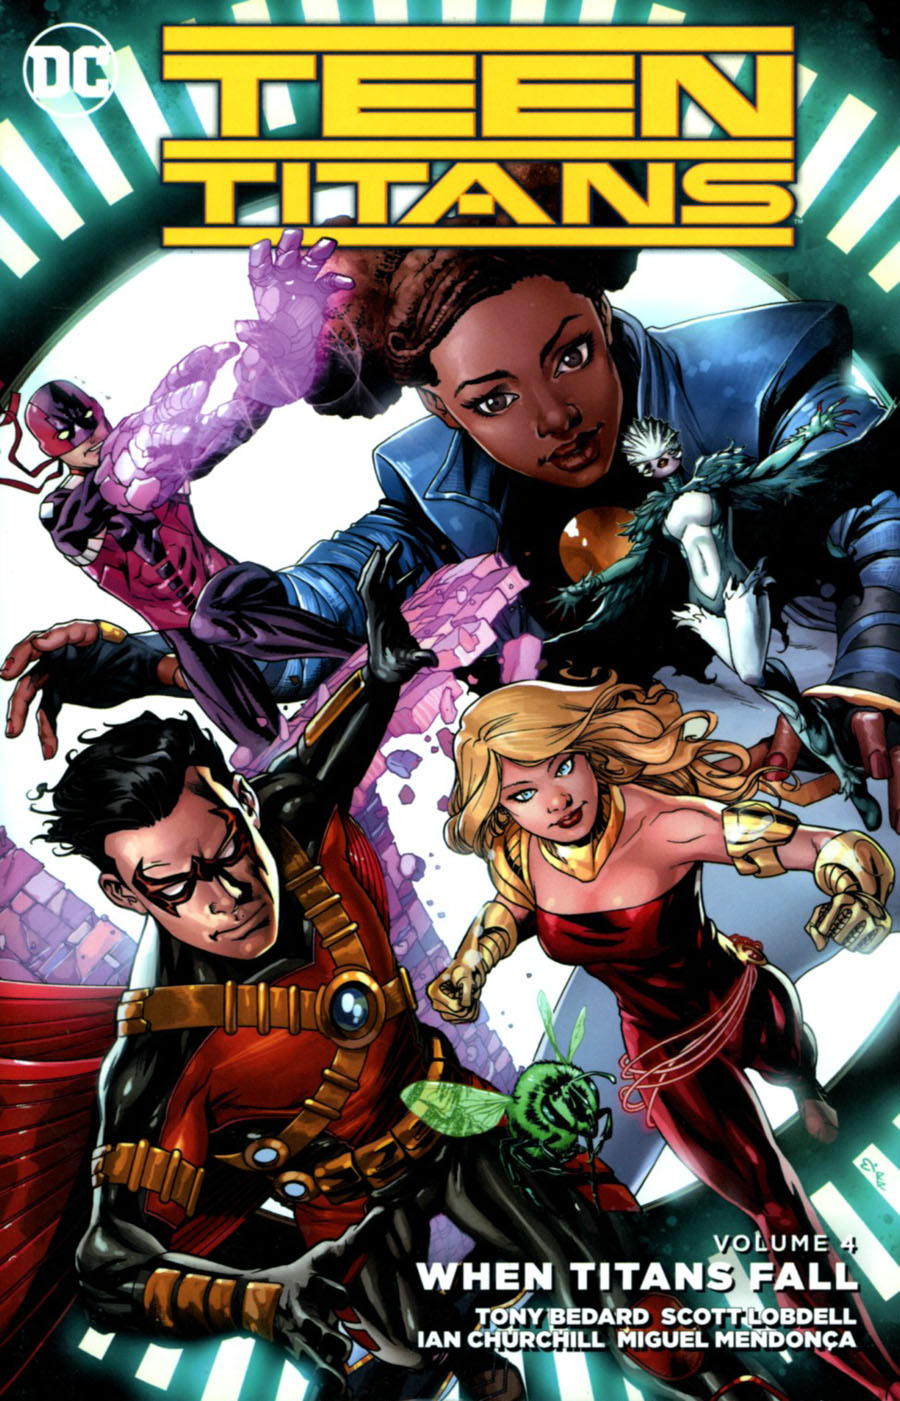 Teen Titans (New 52) Vol 4 When Titans Fall TP